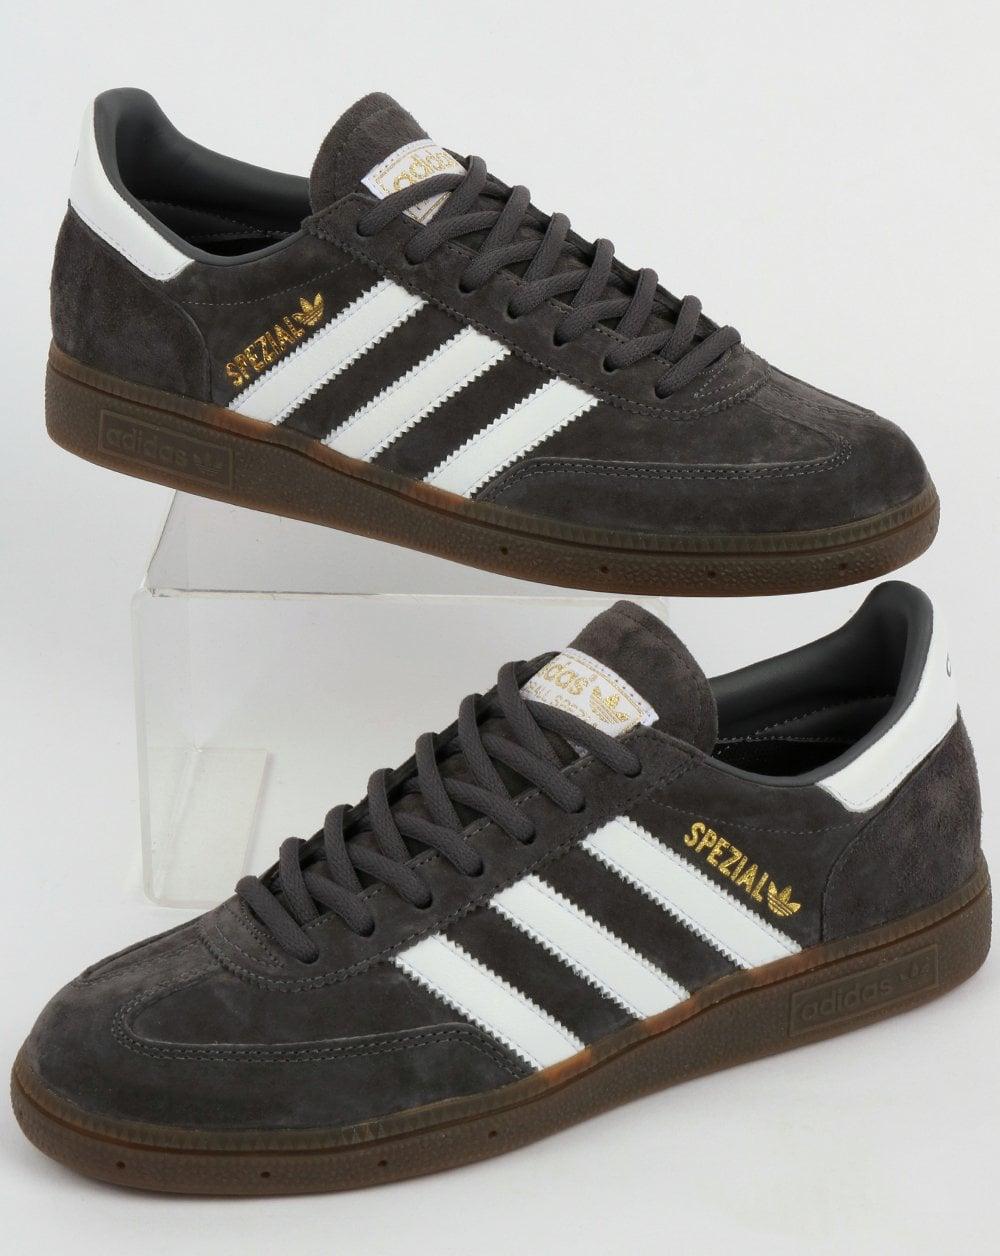 Adidas Spezial Trainers GreyWhite